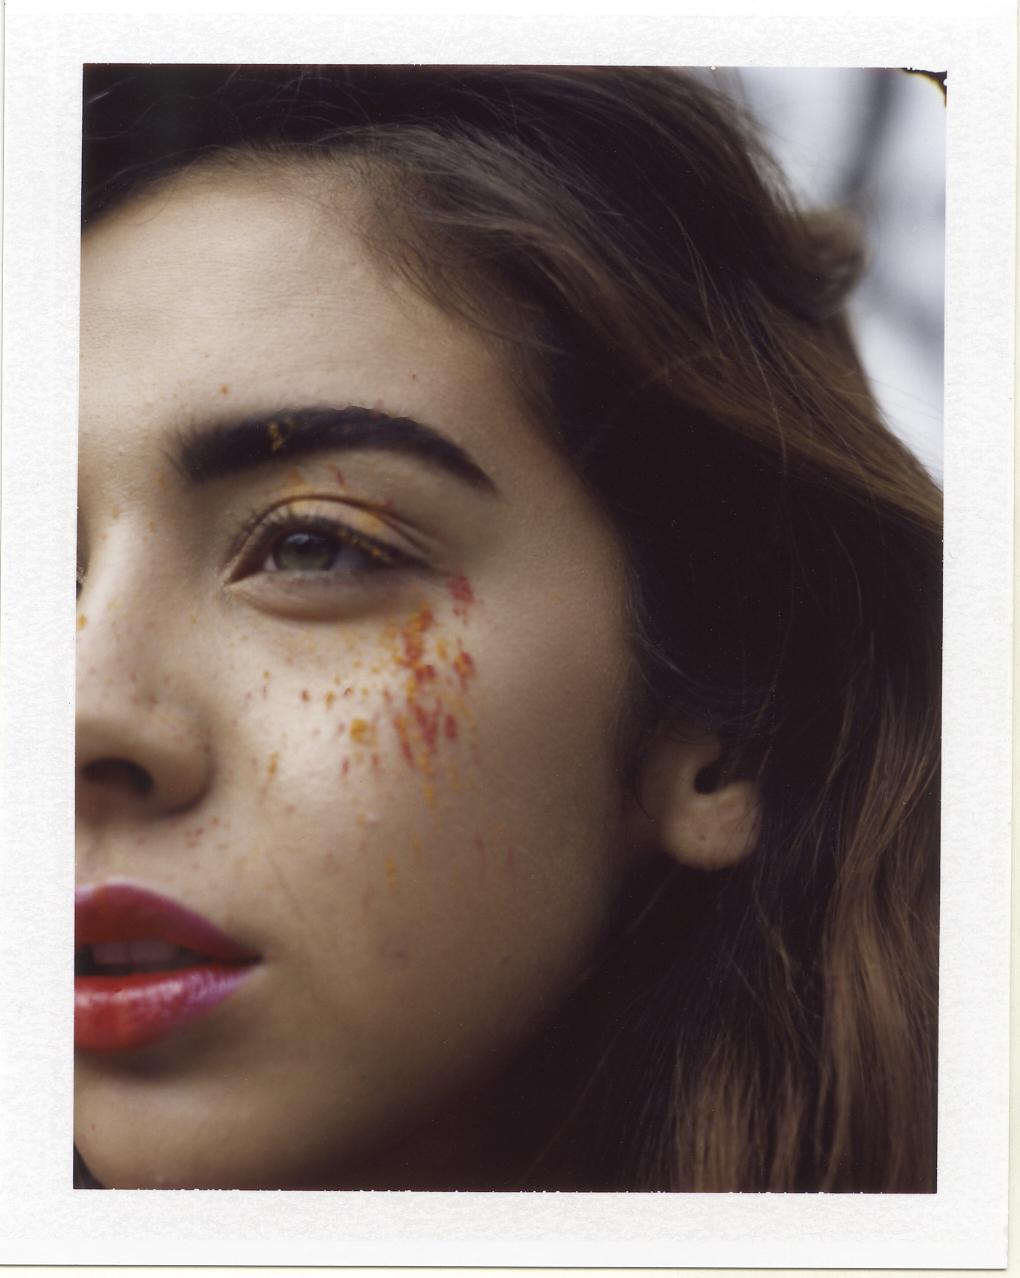 nadia_polaroid001.jpg